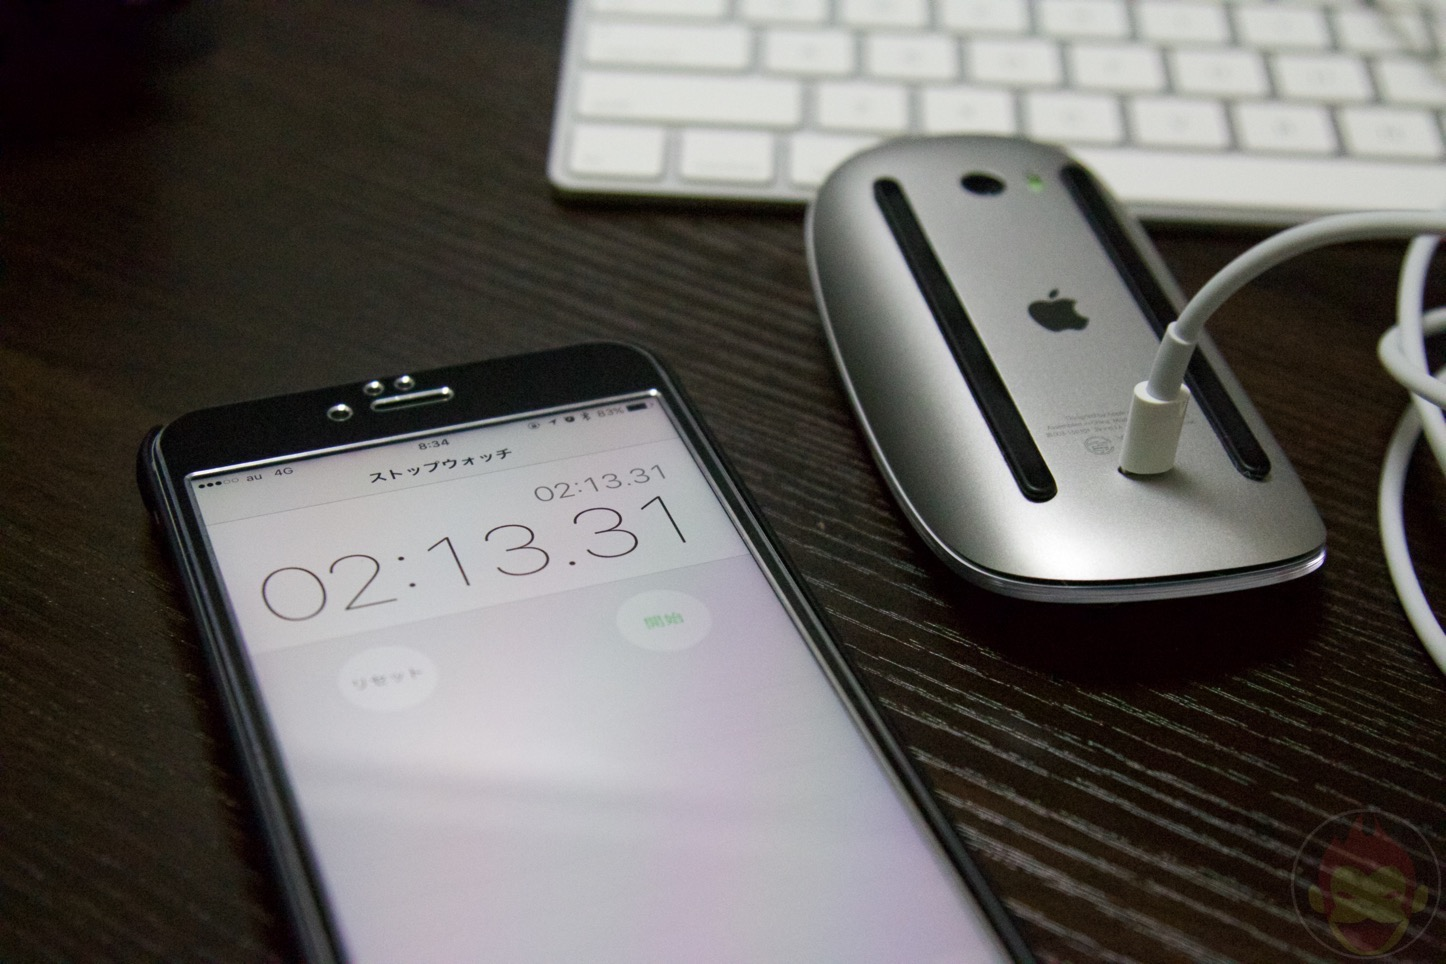 Magic-Mouse-2-Quick-Charging-006.jpg